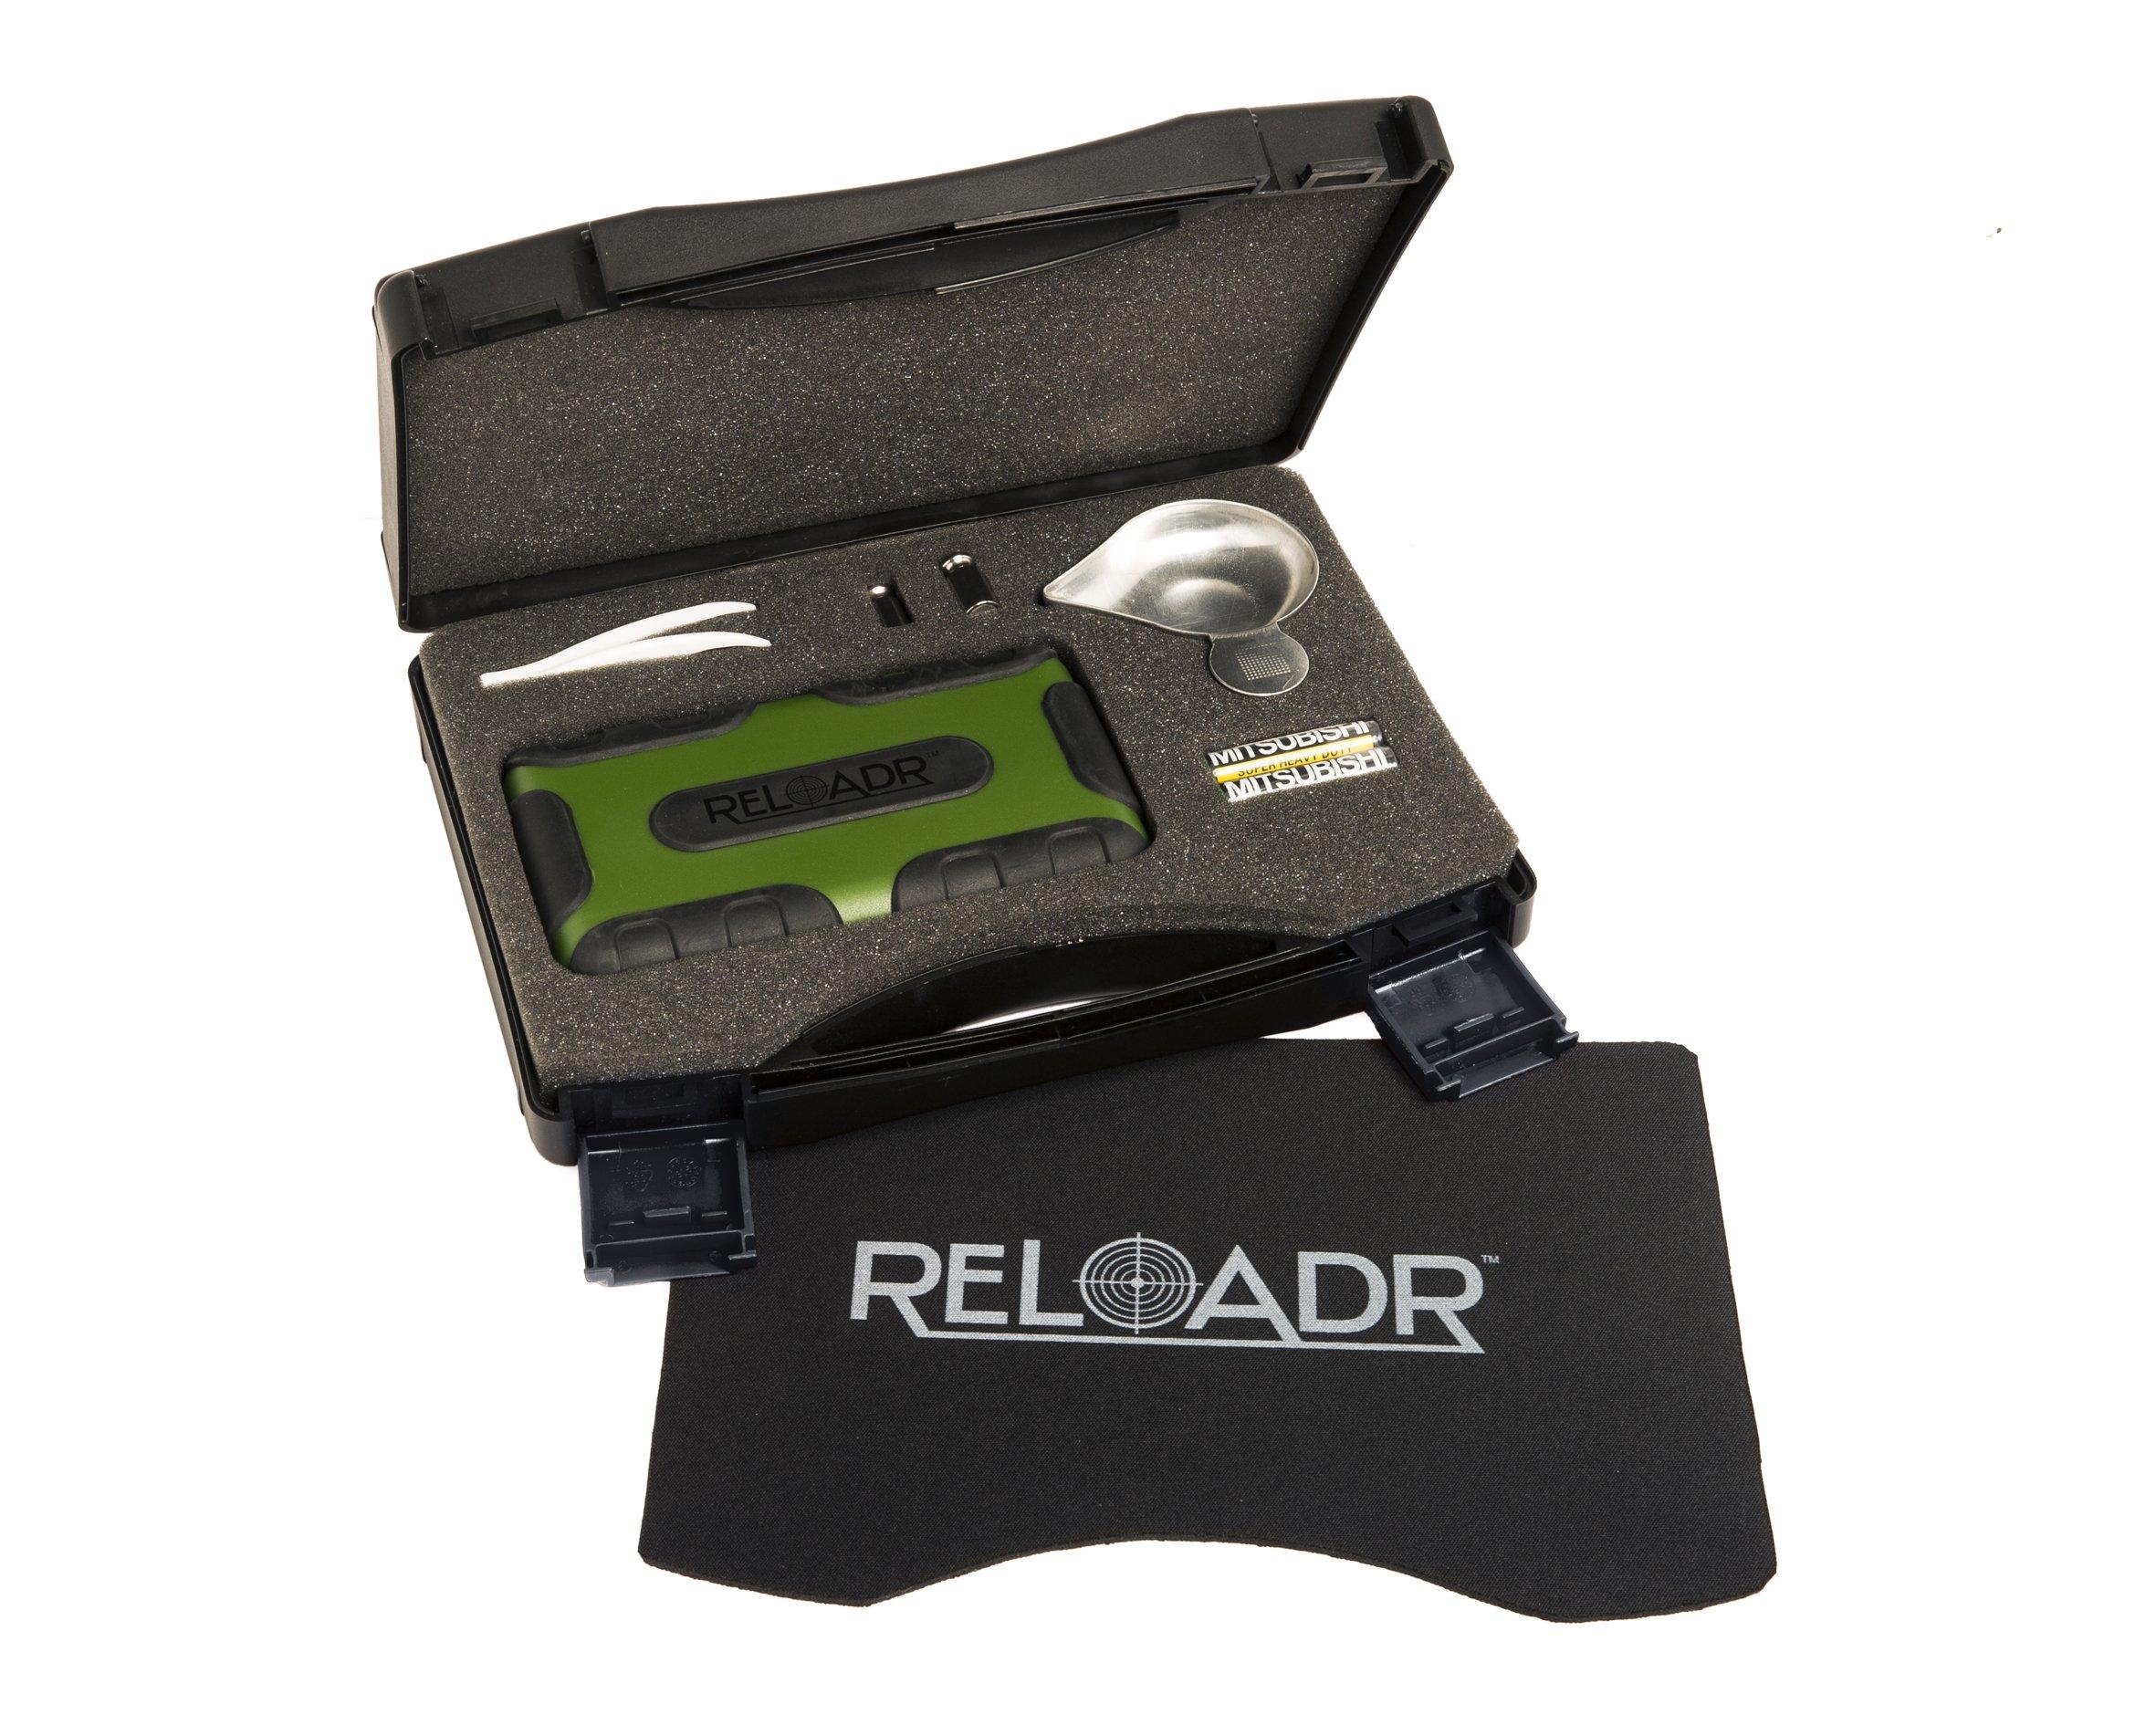 dalman-rld-20-on-balance-reloadr&trade-scale-kit-20g-x-0001g